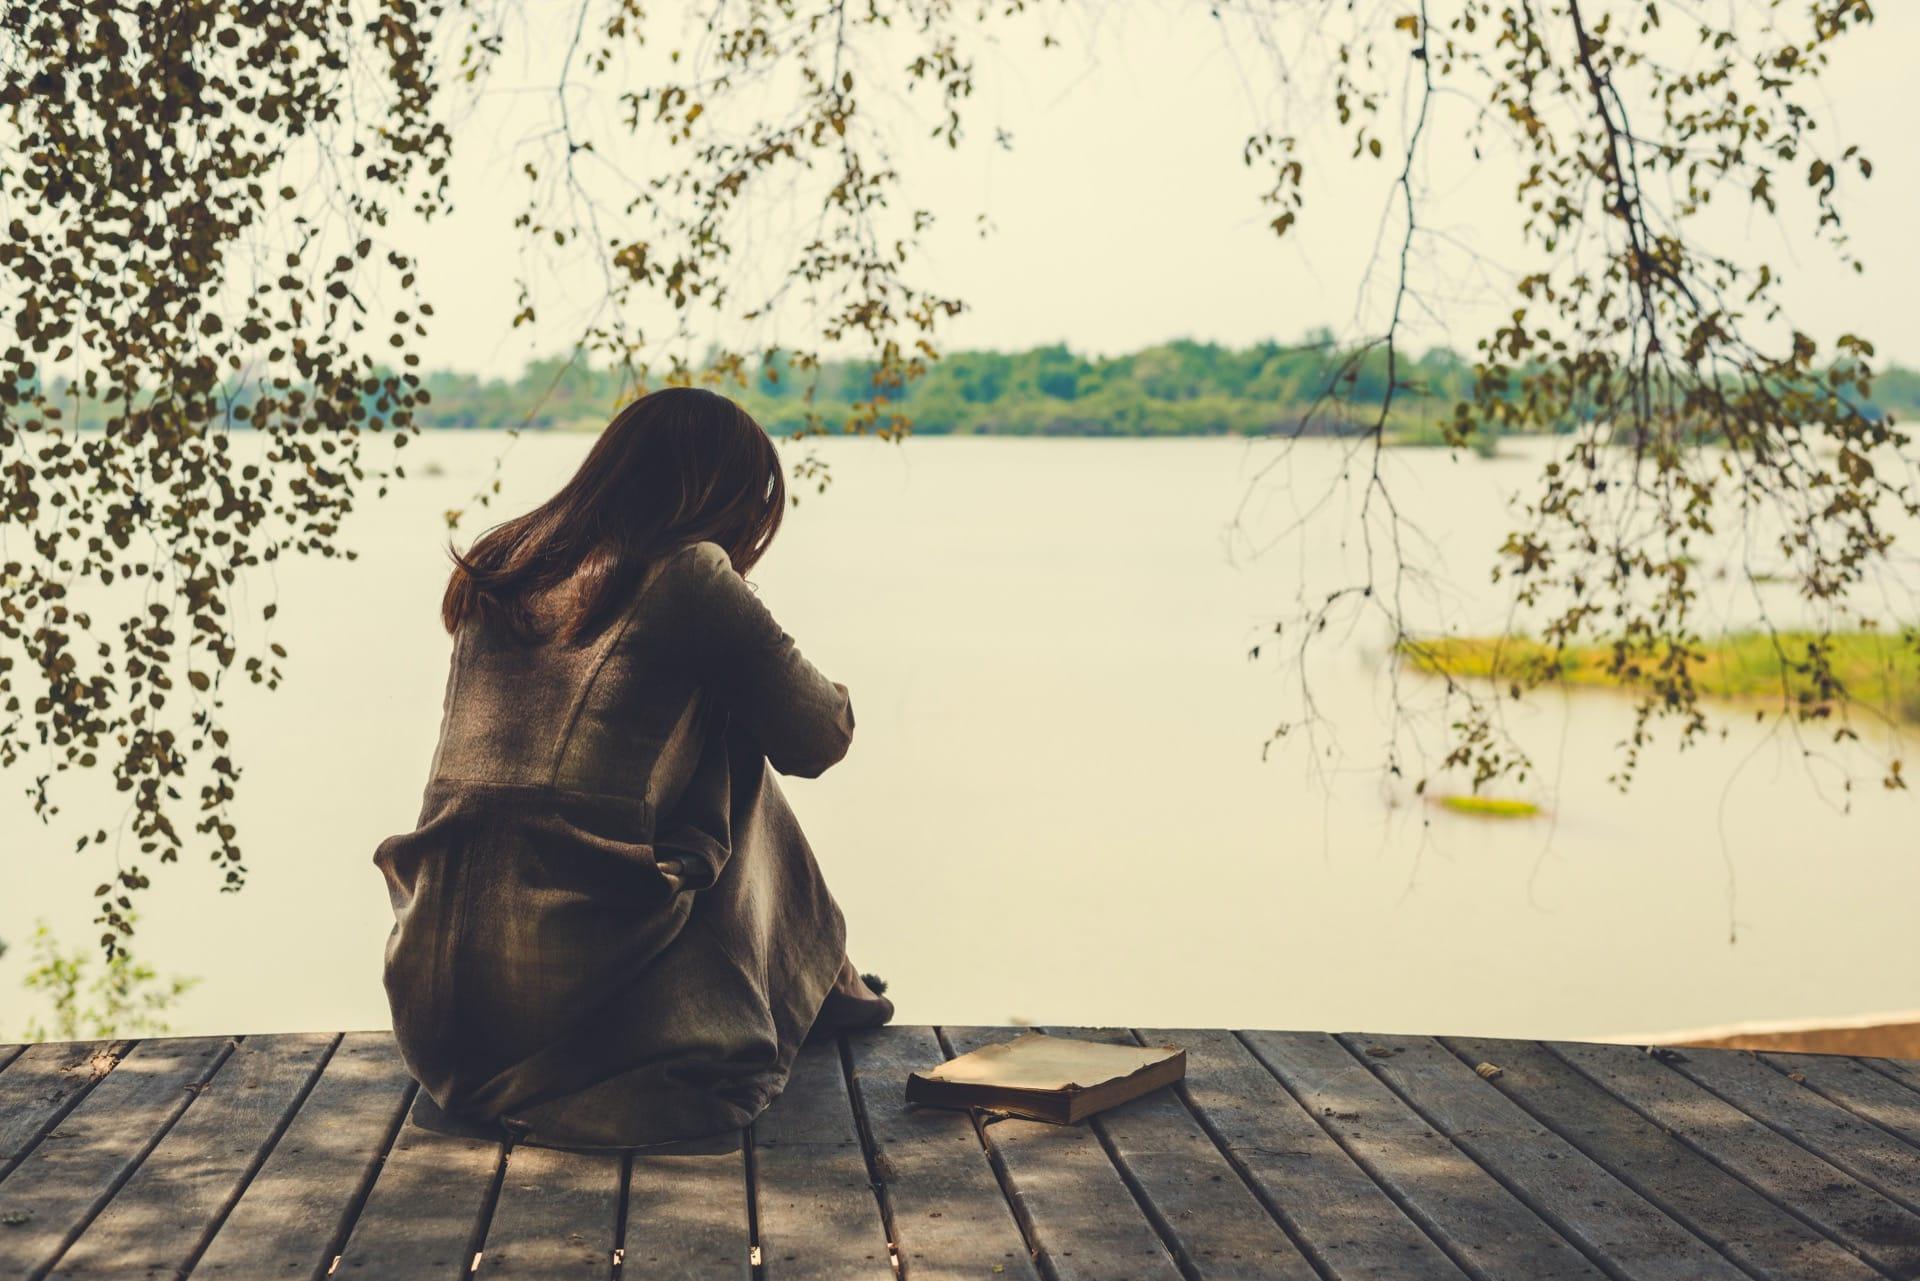 Slika naših trenutnih osećanja - Page 5 Lonely-sad-woman-sitting-looking-out-at-the-water